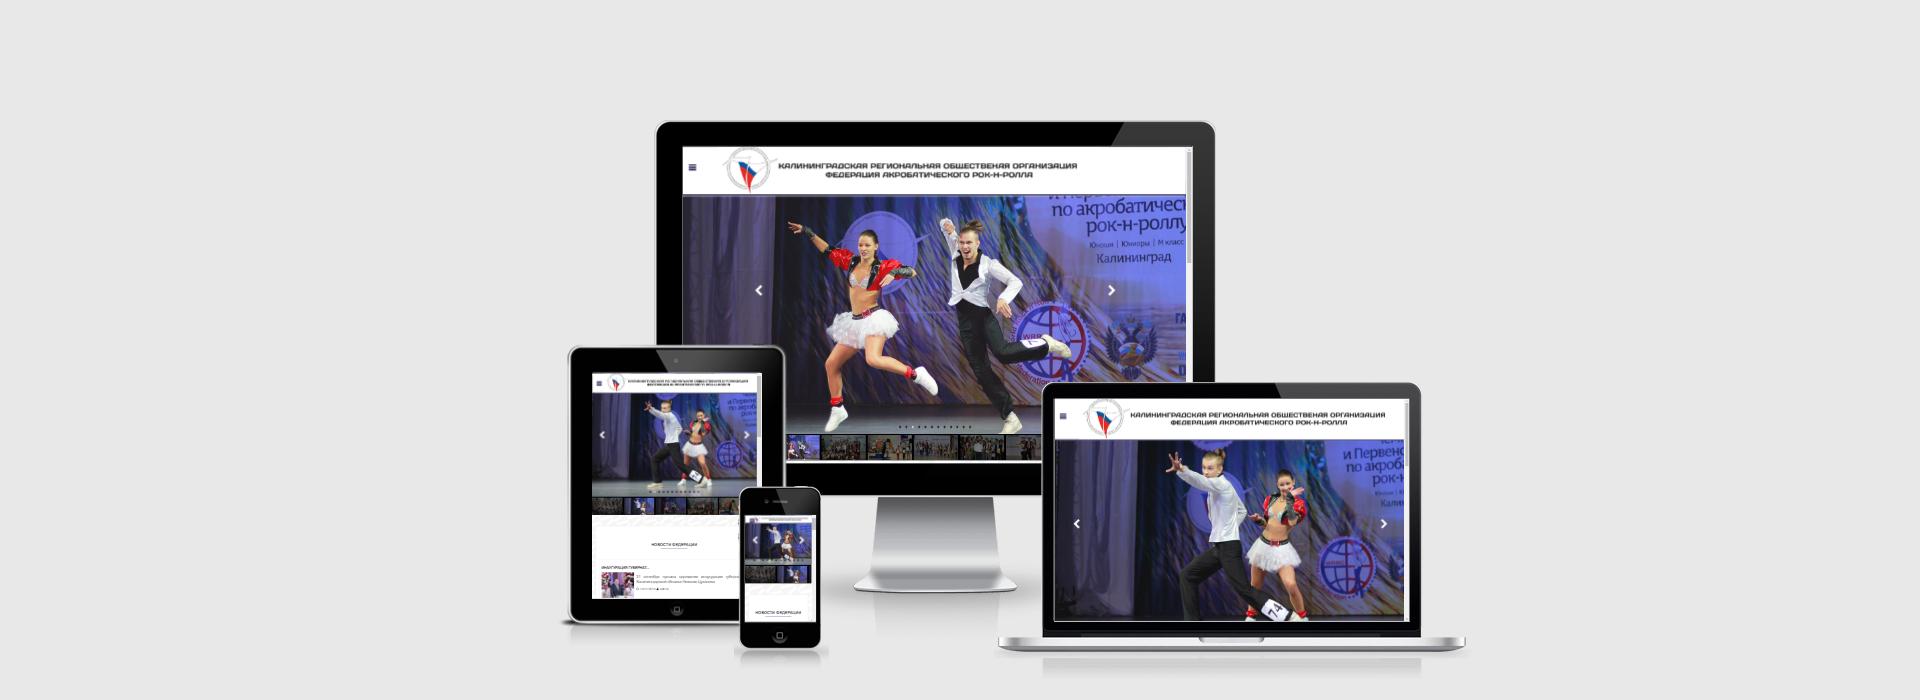 Сайт Федерации Акробатического Рок-н-ролла